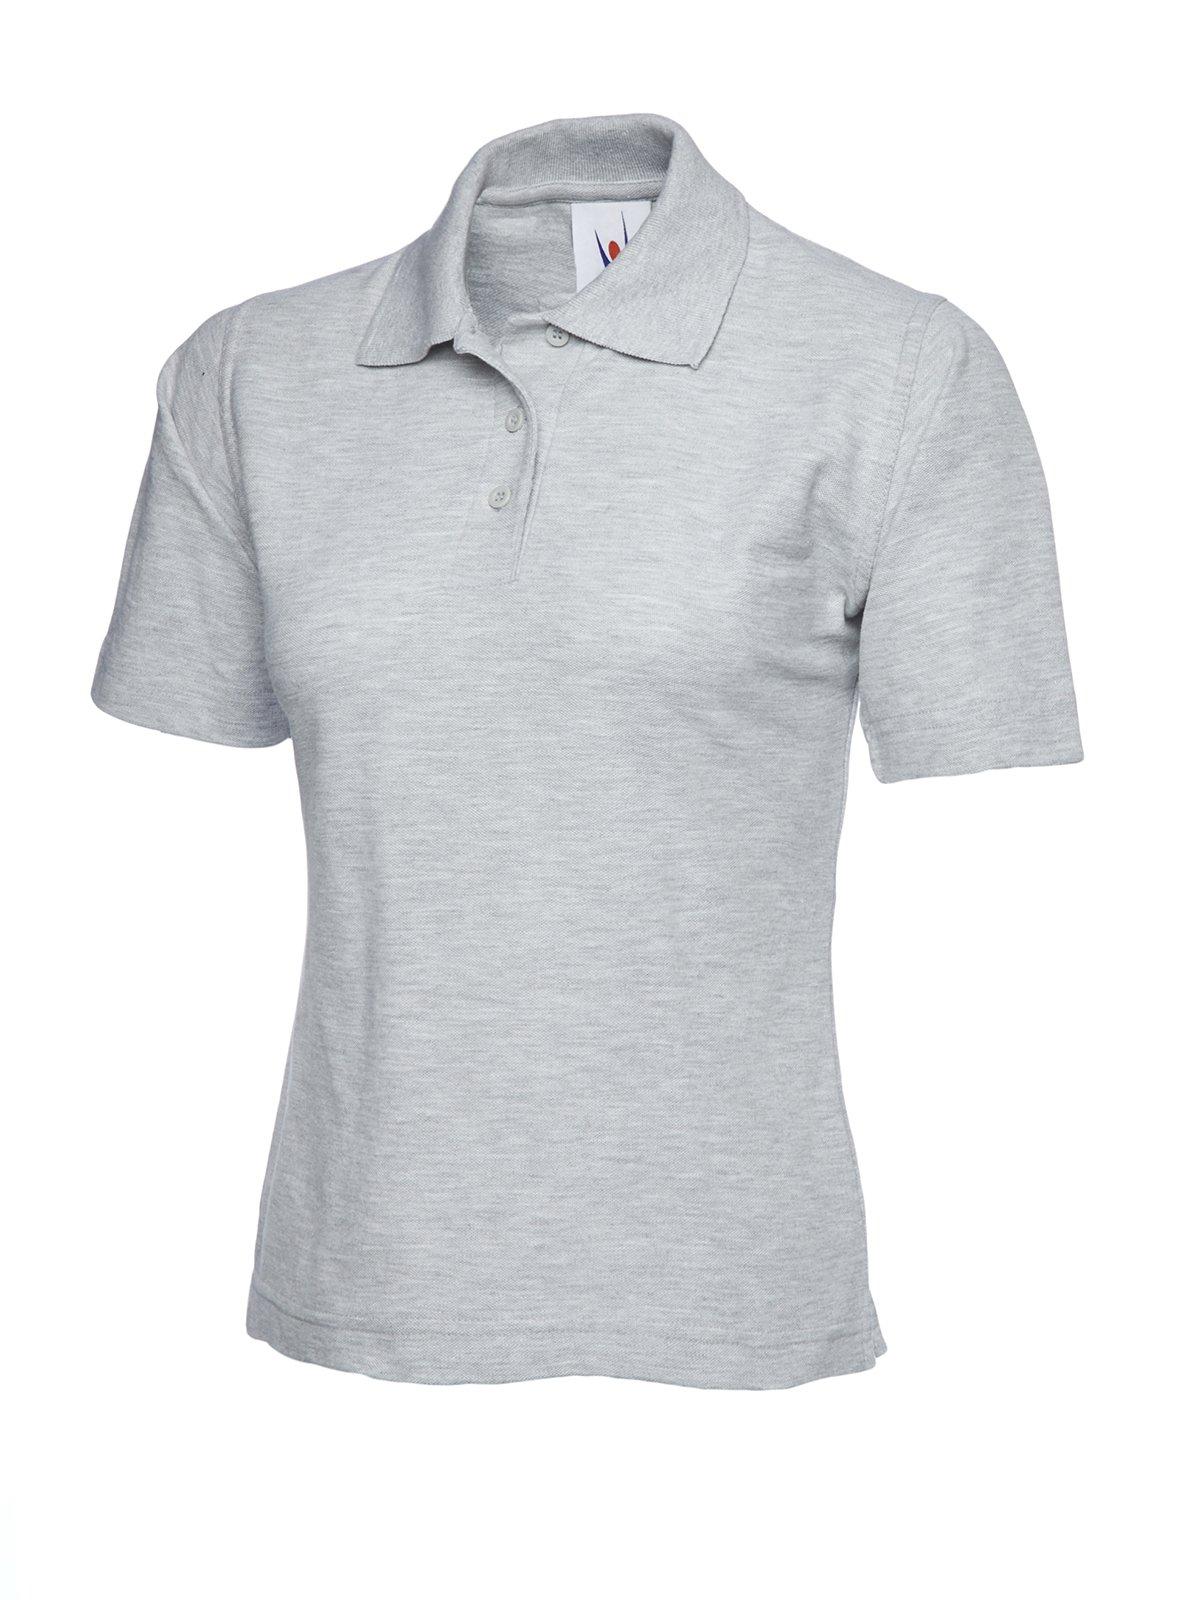 Uneek clothing - Polo - - Polo - Col polo - Manches courtes Femme